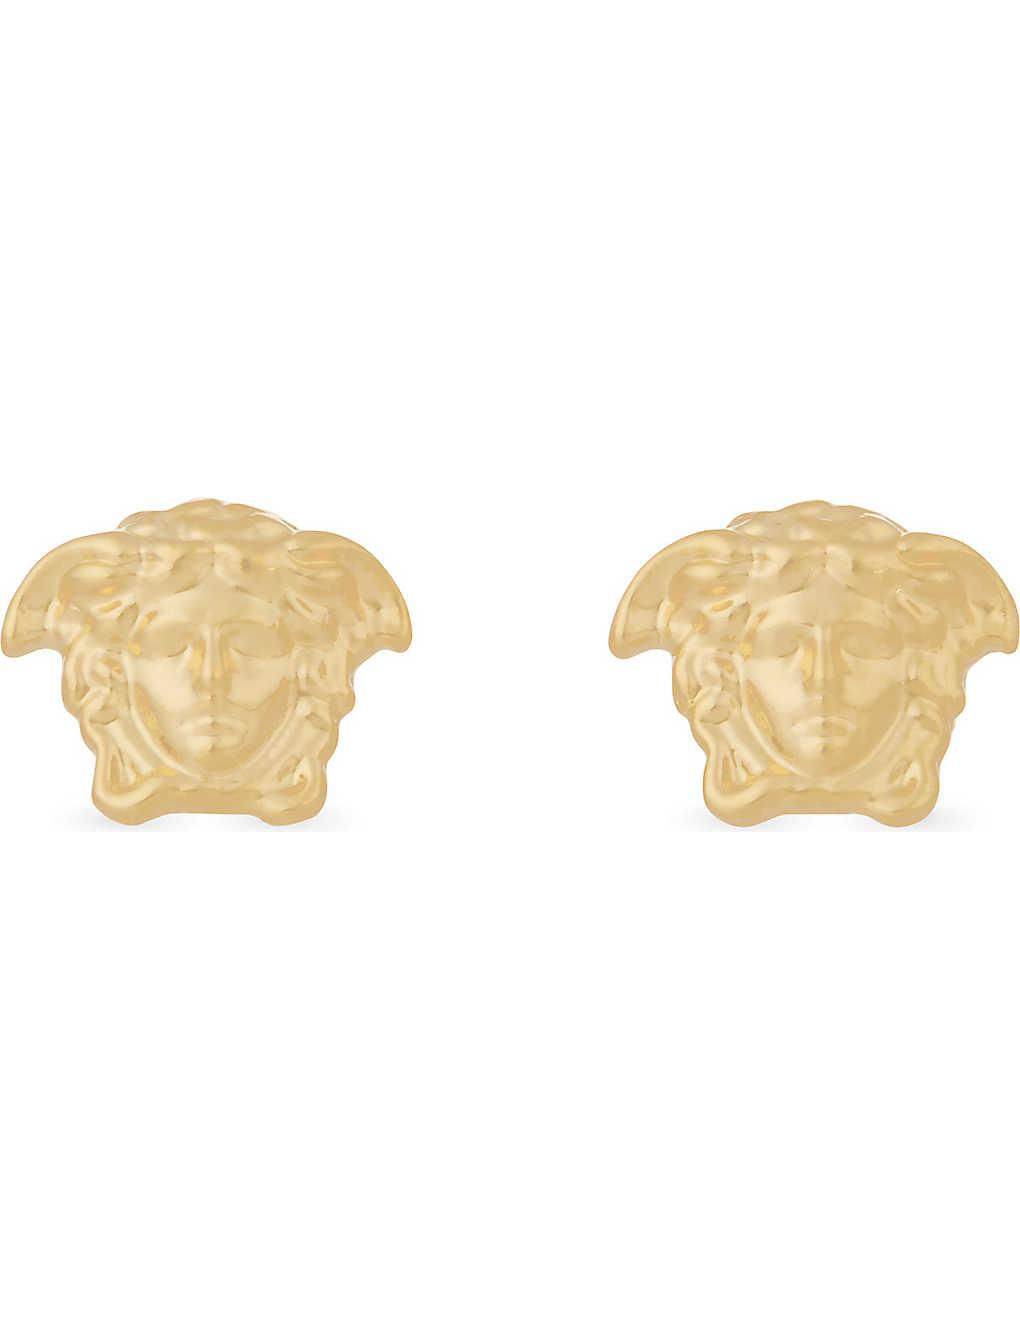 ef4f468b6 VERSACE - Medusa stud gold-tone earrings | Selfridges.com